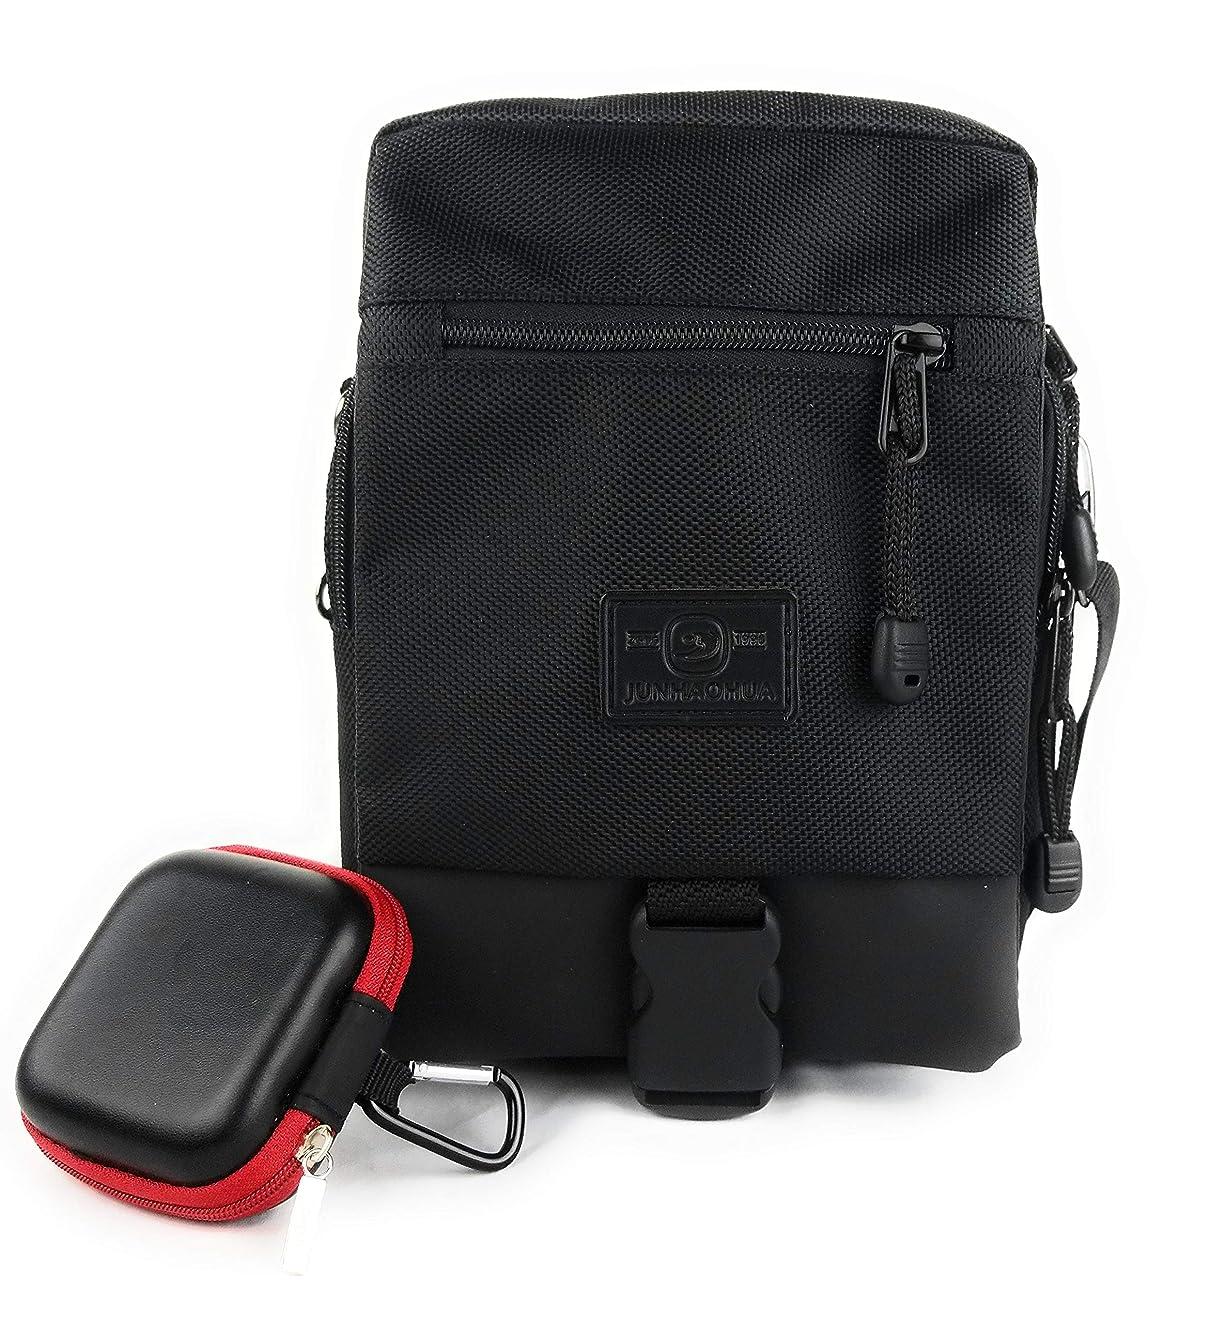 Compact Messenger Sling Crossbody Bag Satchel Perfect for iPad Mini, Kindle, E-Readers Men Women Students